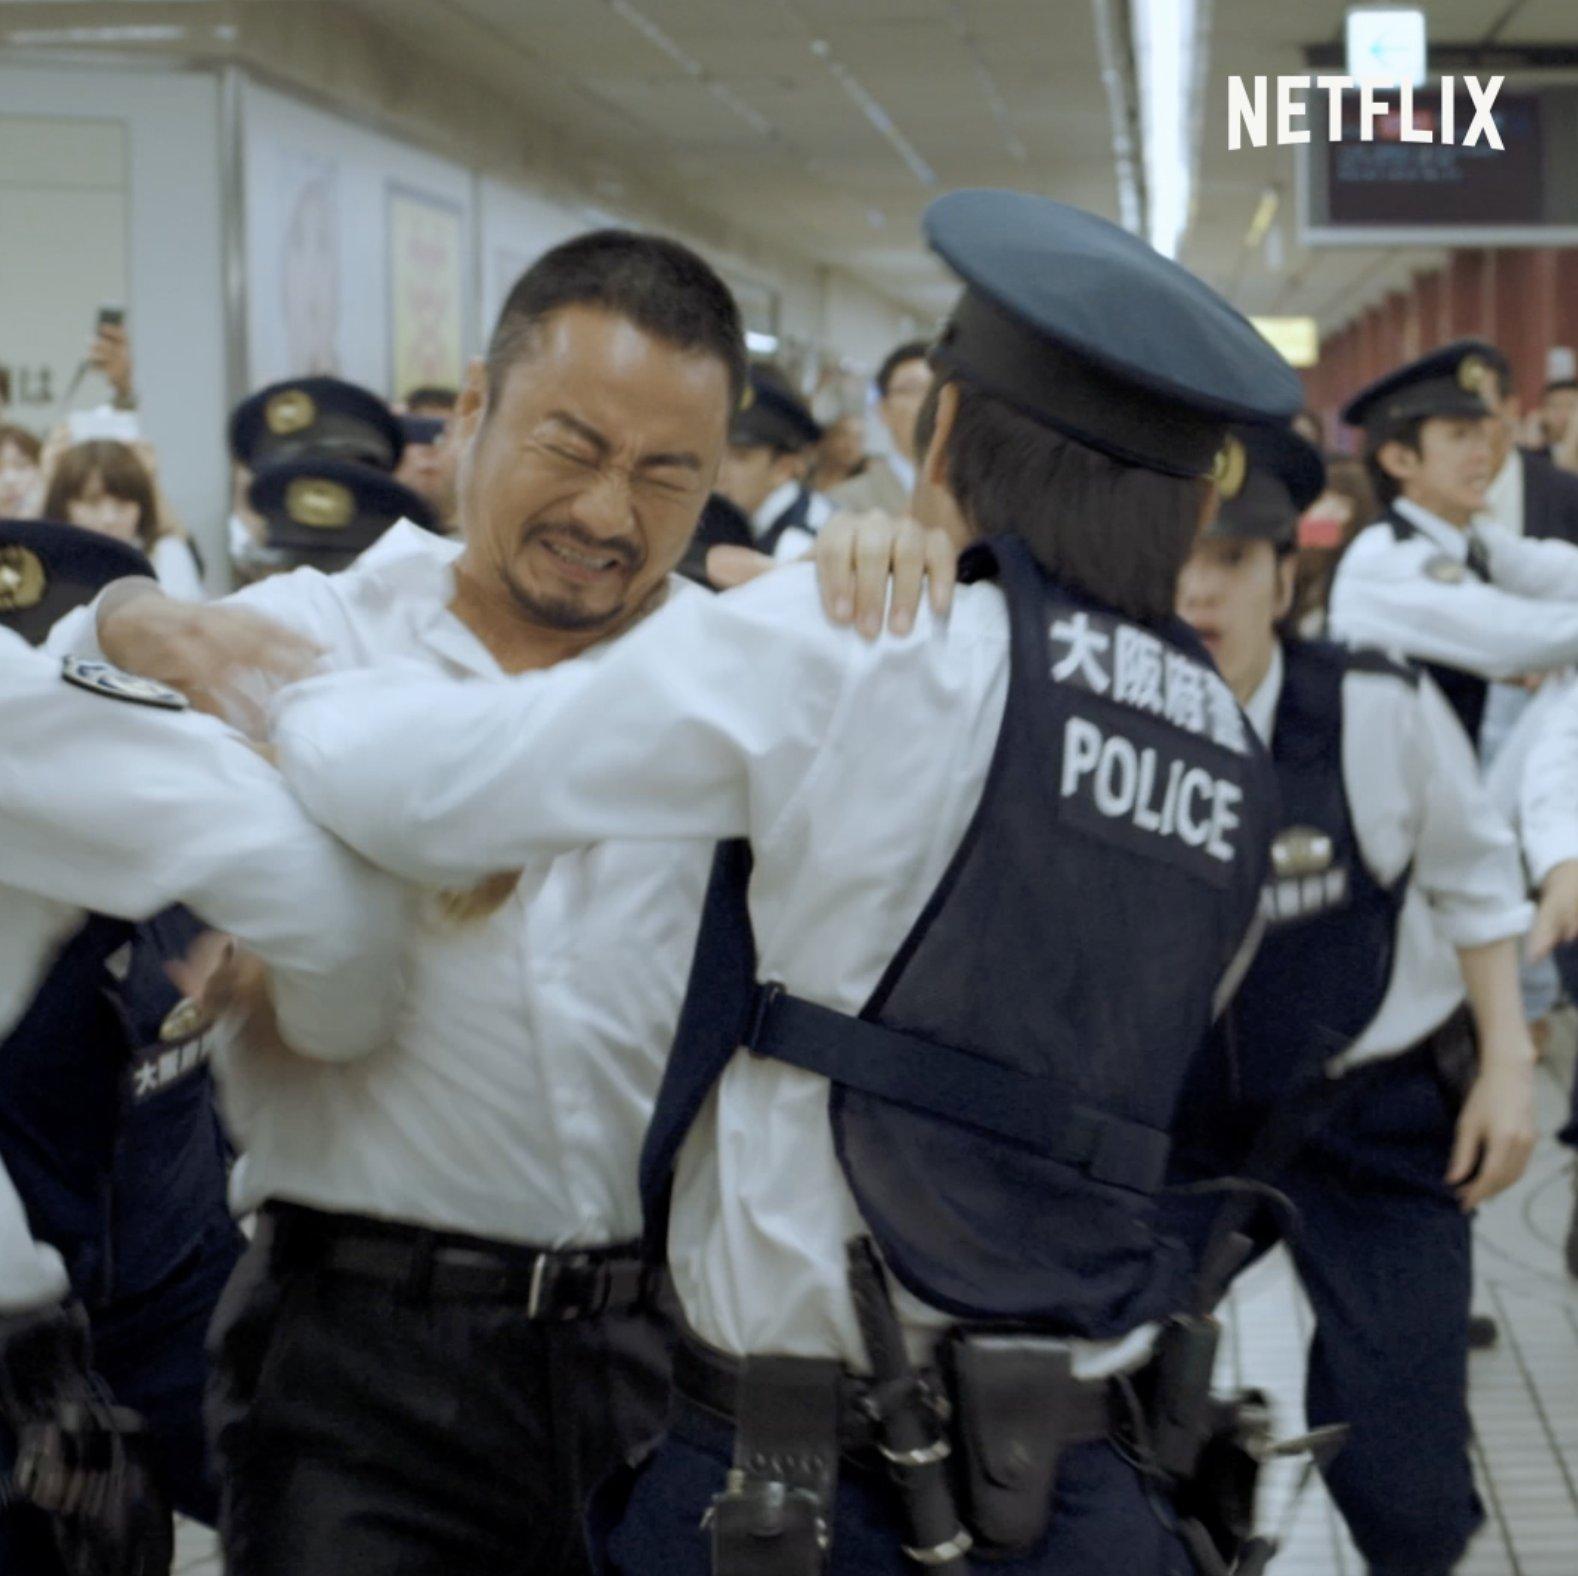 John Woo directed a new movie!  John! Woo! Directed! A! New! Movie!  (it bears repeating) https://t.co/EK0tBv9JQp